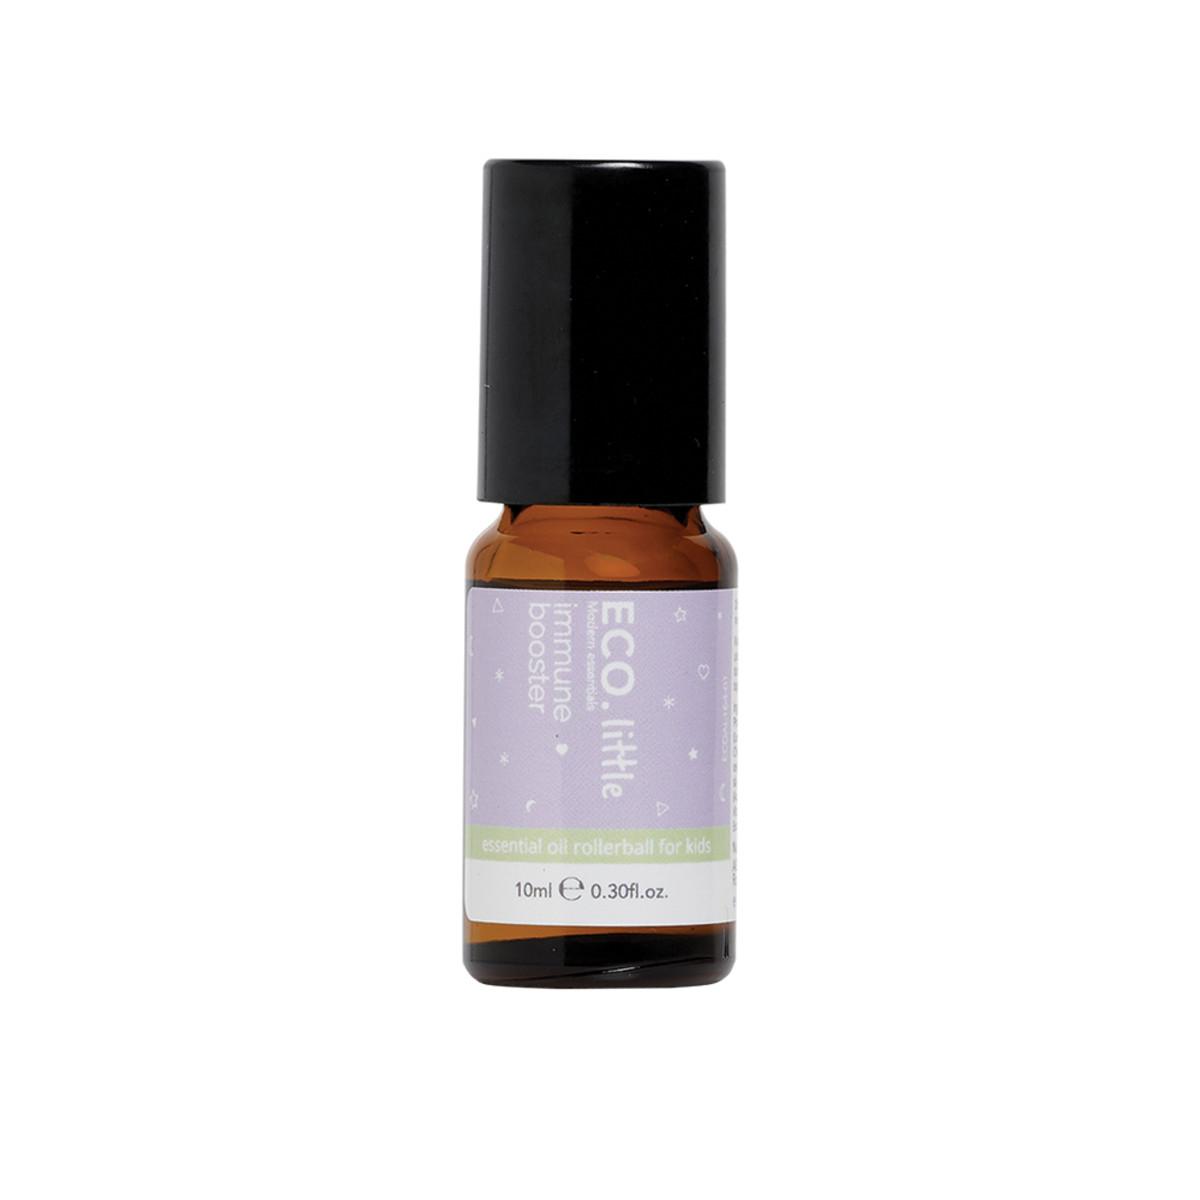 ECO Little Essential Oil Rollerball Immune Booster 10ml_media-01